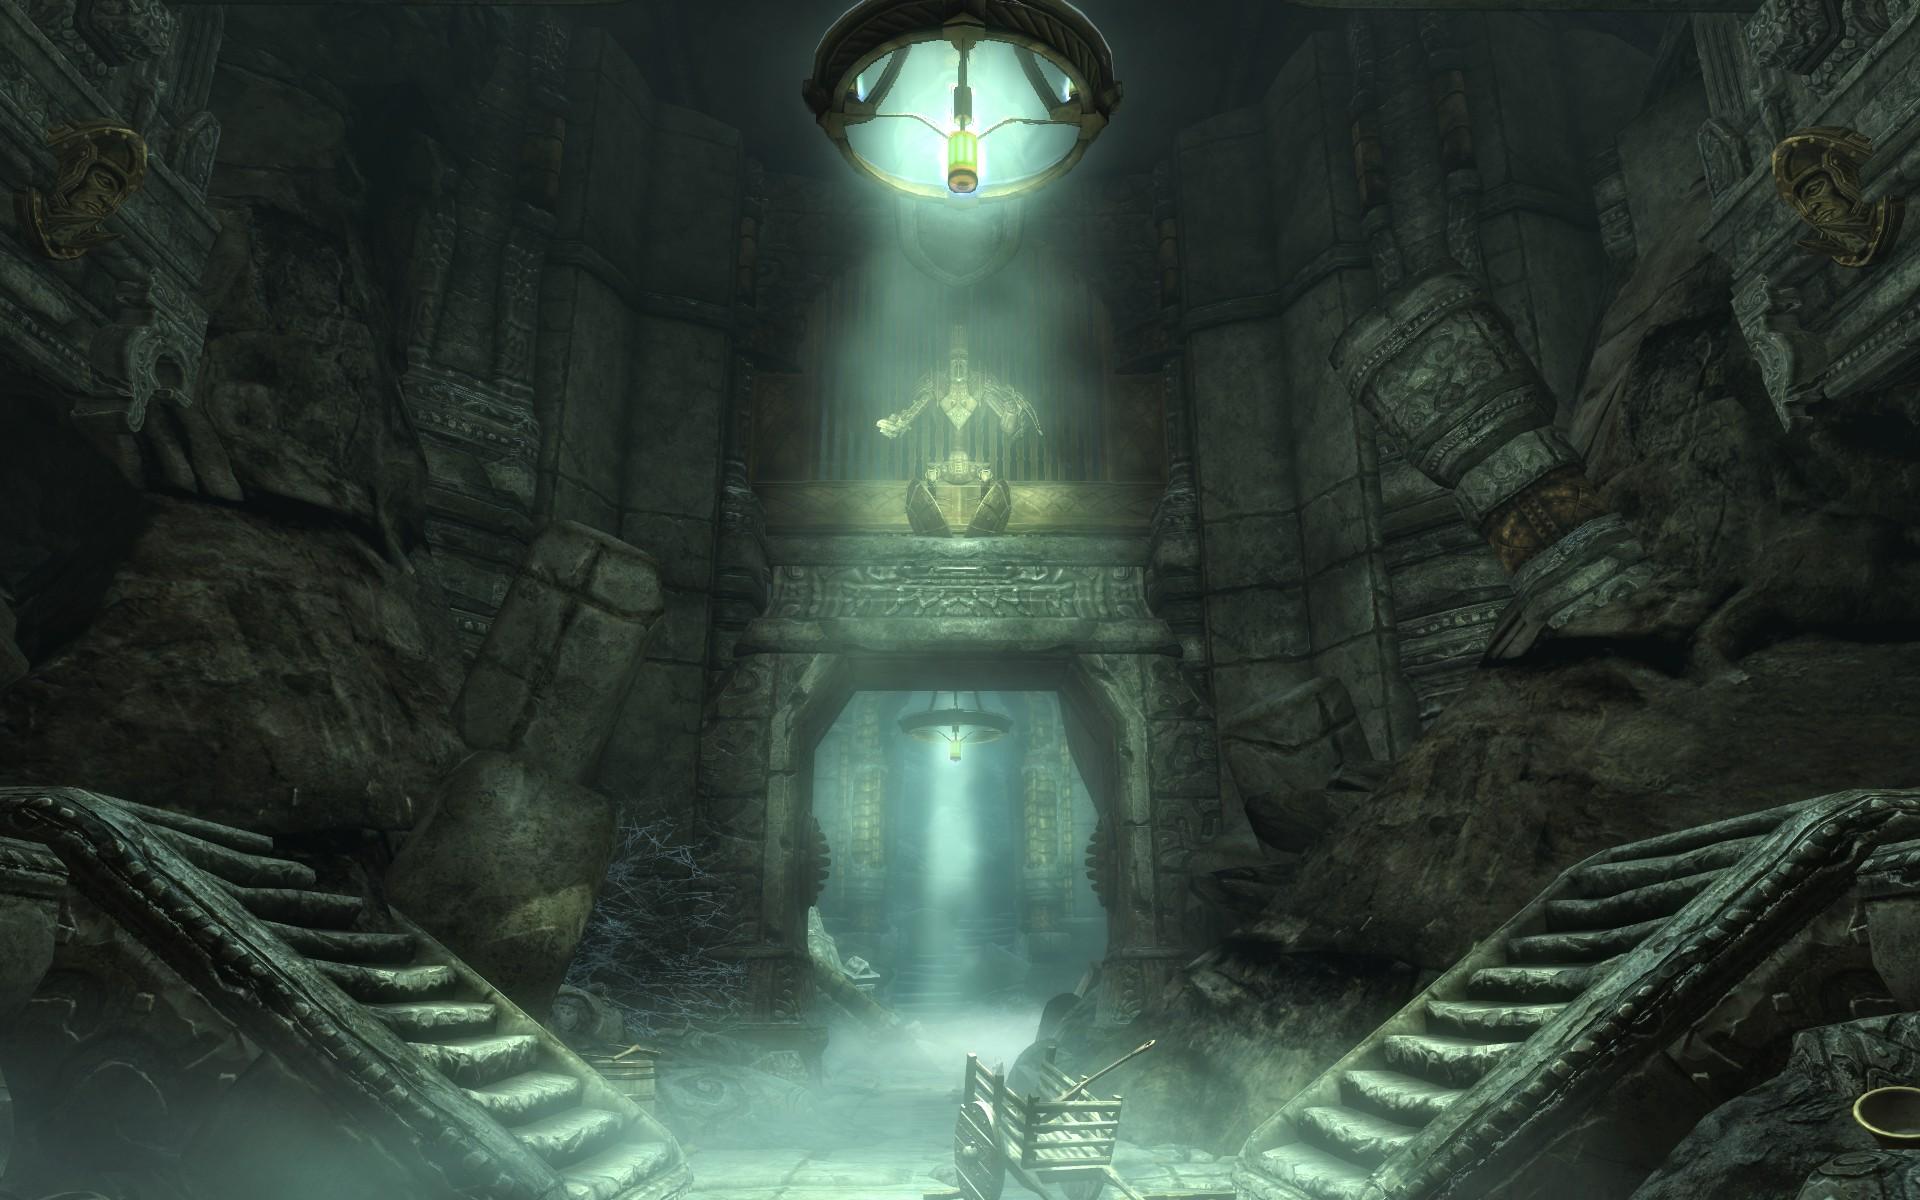 Nchuand-Zel: Ausgrabungsstätte | Elder Scrolls Wiki | FANDOM powered ...